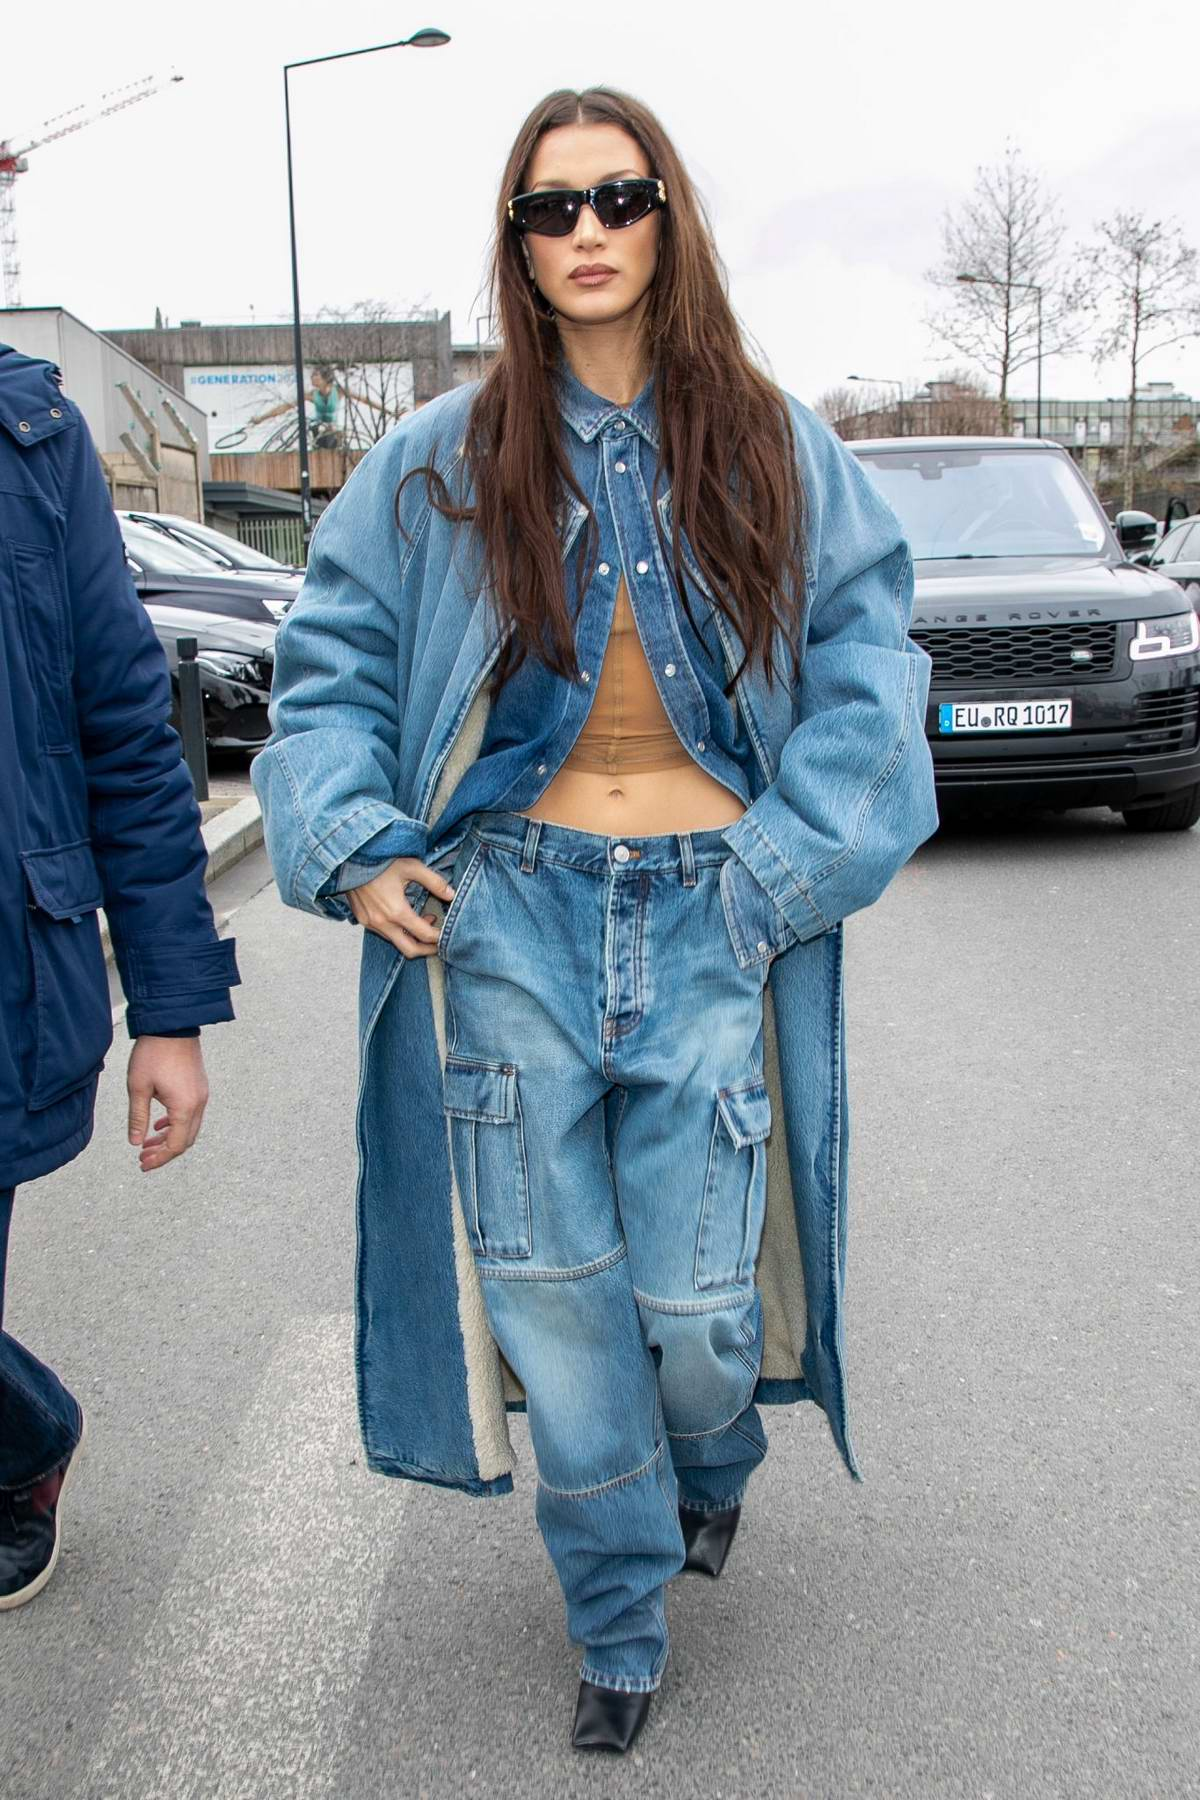 Bella Hadid attends the Balenciaga fashion show, F/W 2020 during Paris Fashion Week in Paris, France